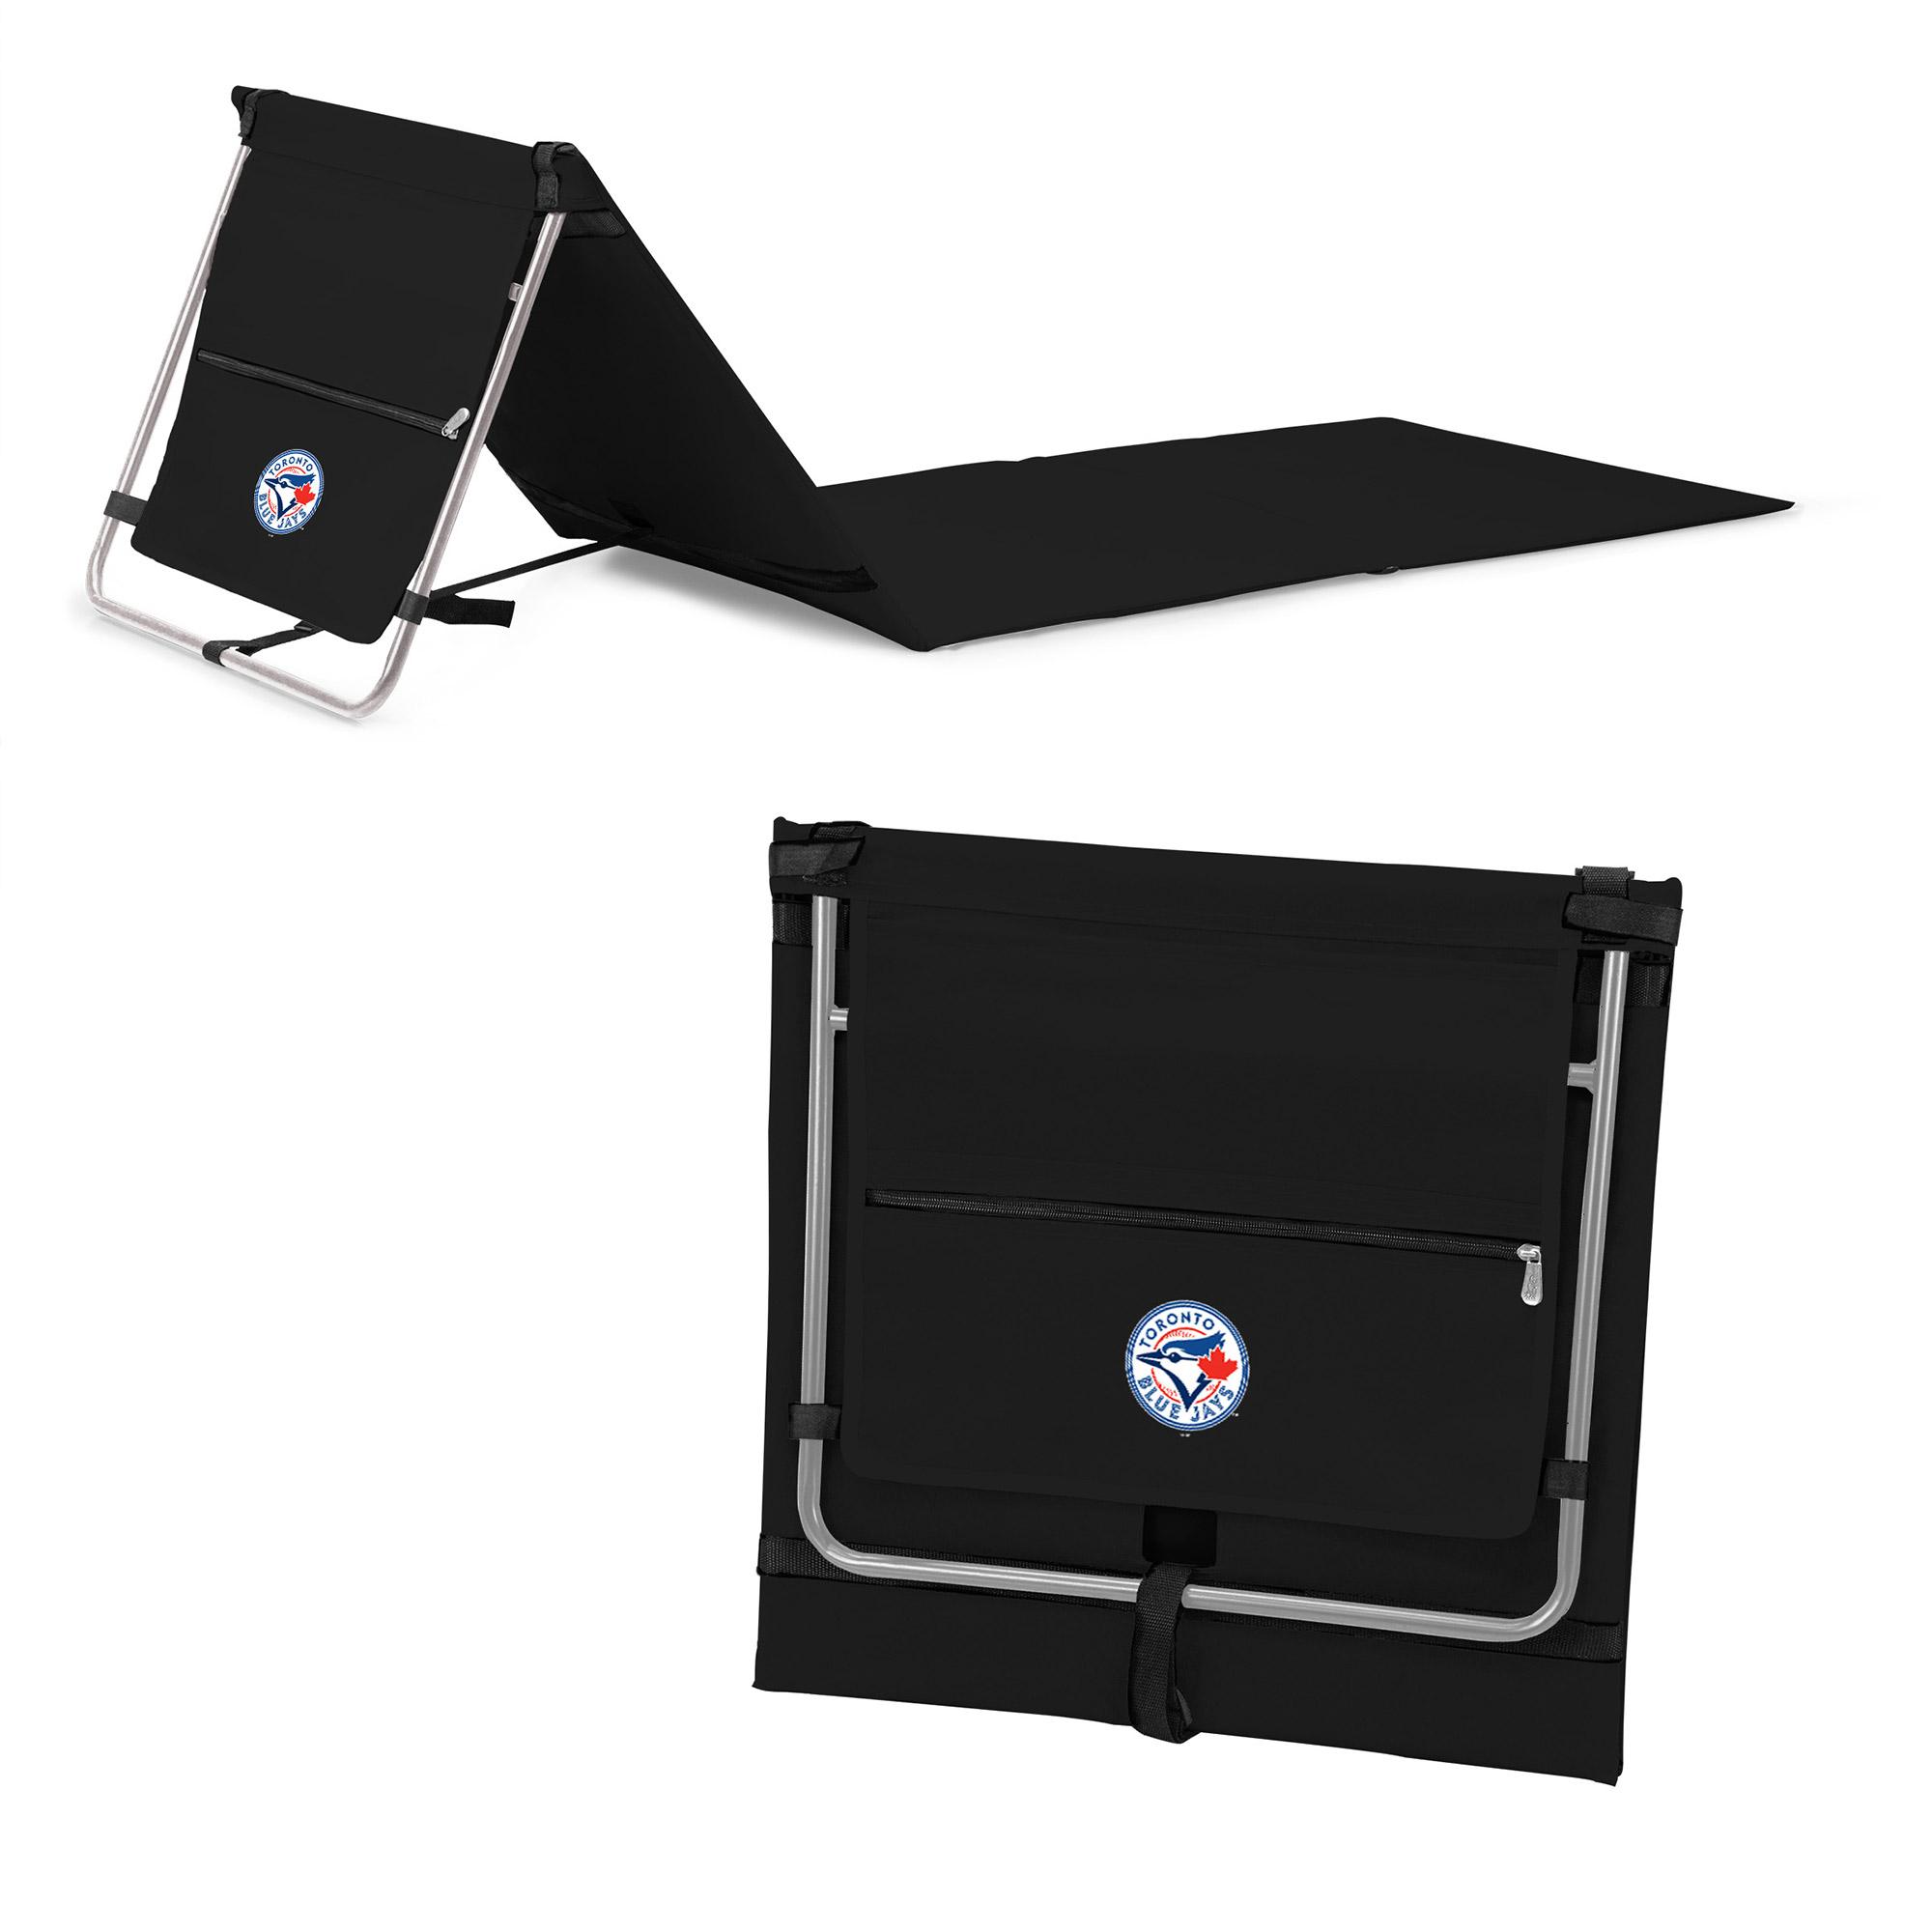 Toronto Blue Jays Portable Lounger Beach Mat - Black - No Size